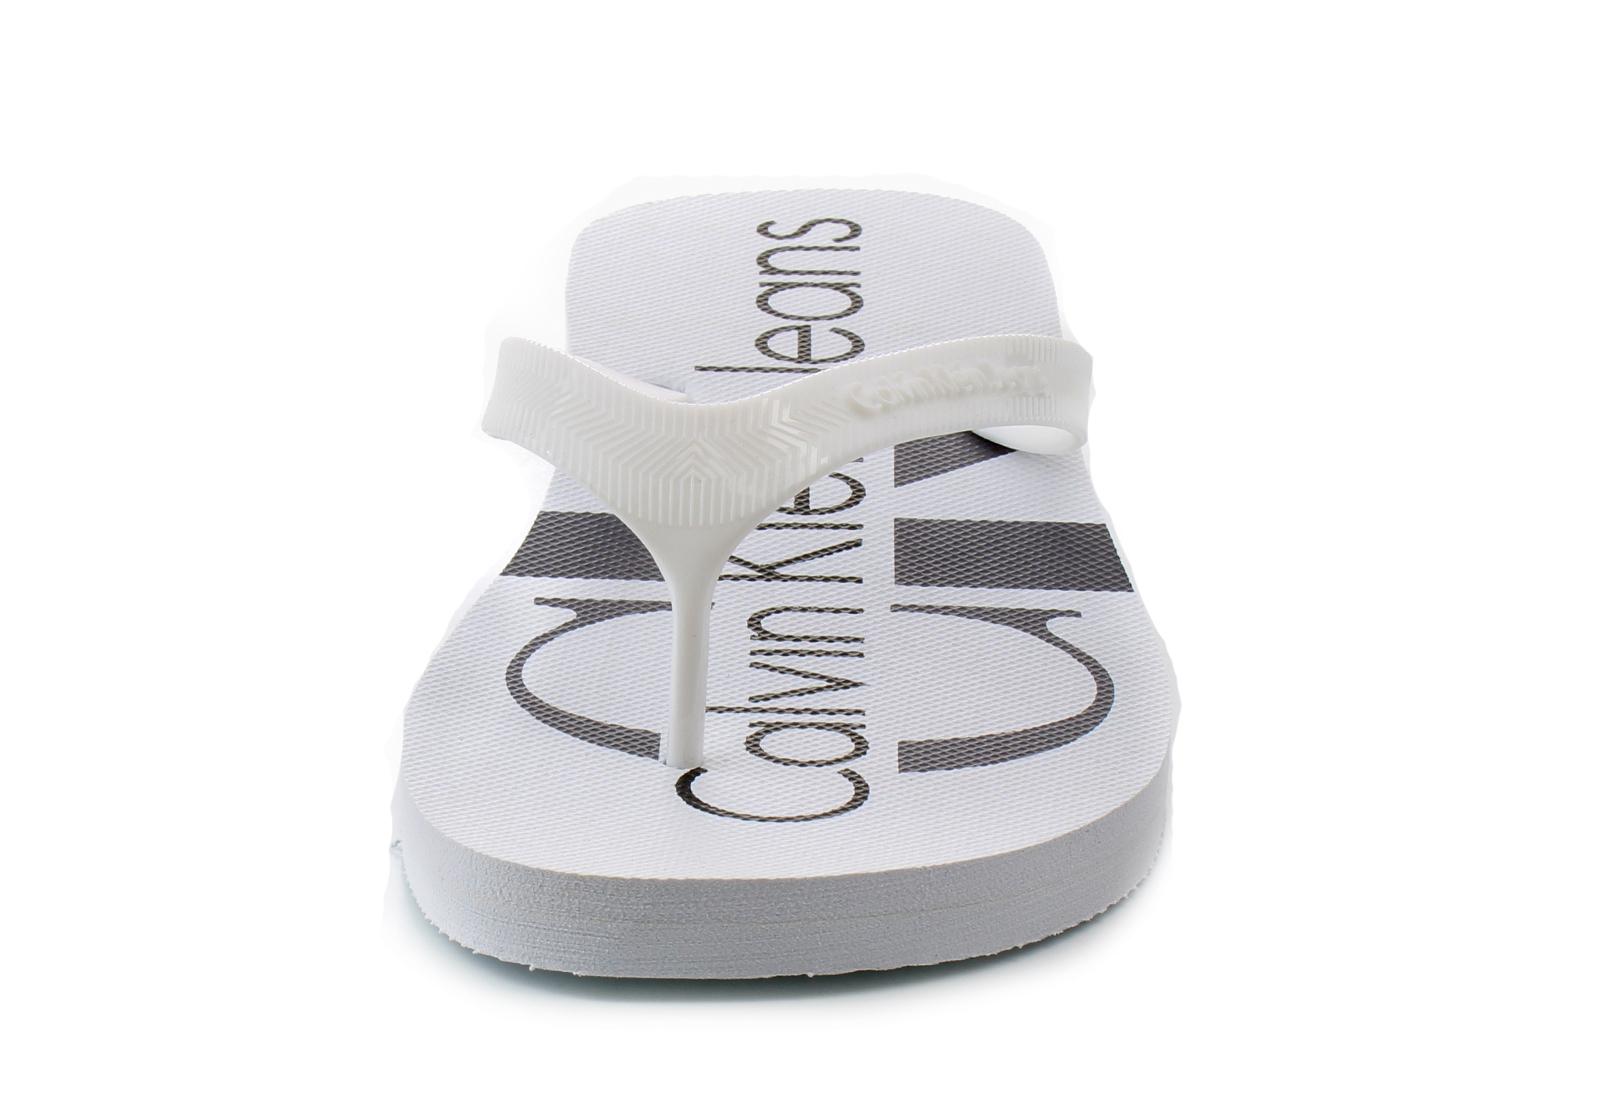 Calvin Klein Jeans Slippers - Dash - S0063-WHT - Online shop for ... b9e9ffe133